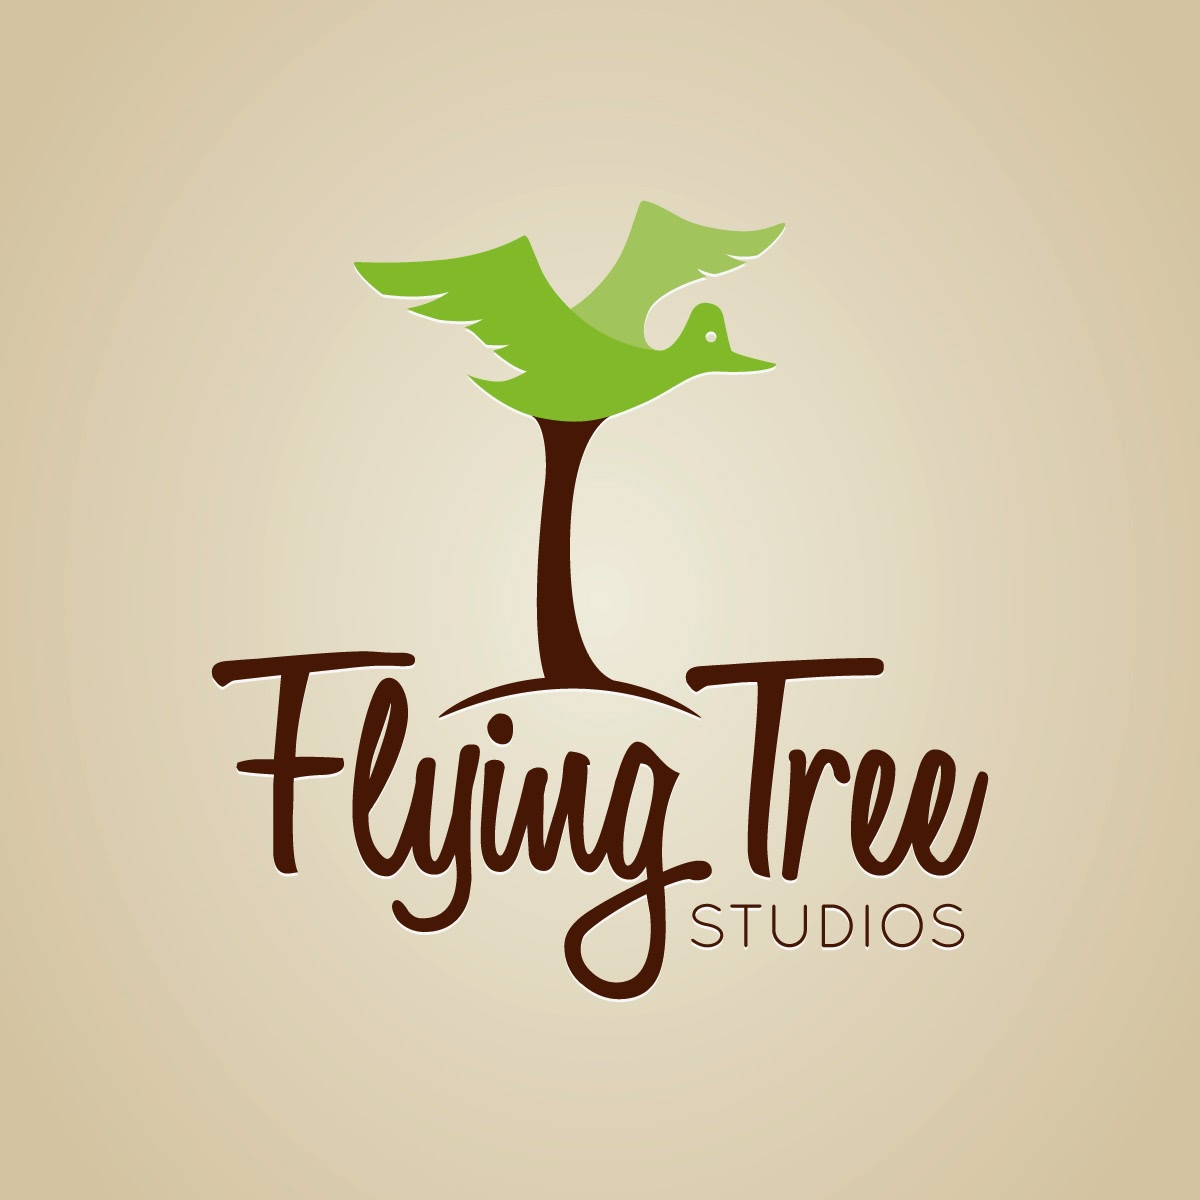 Visit Flying Tree Studios!